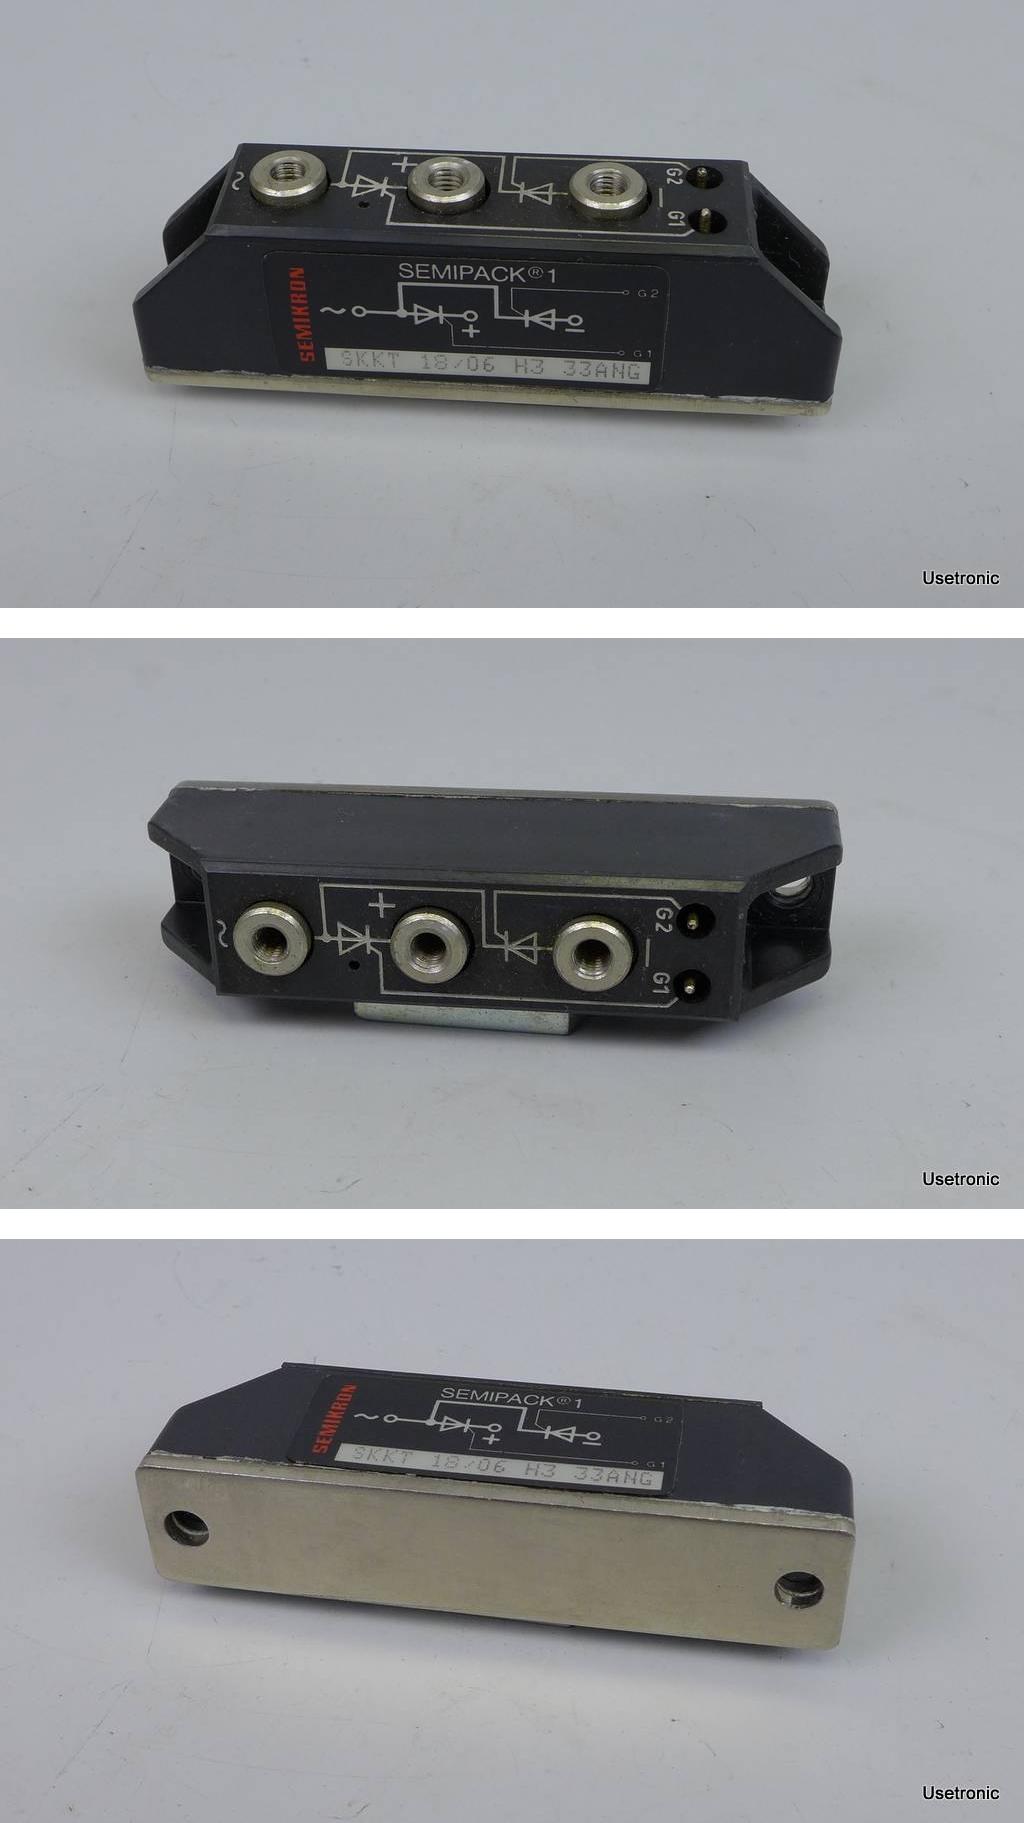 Semikron Semipack 1 SKKT 18/06 H3